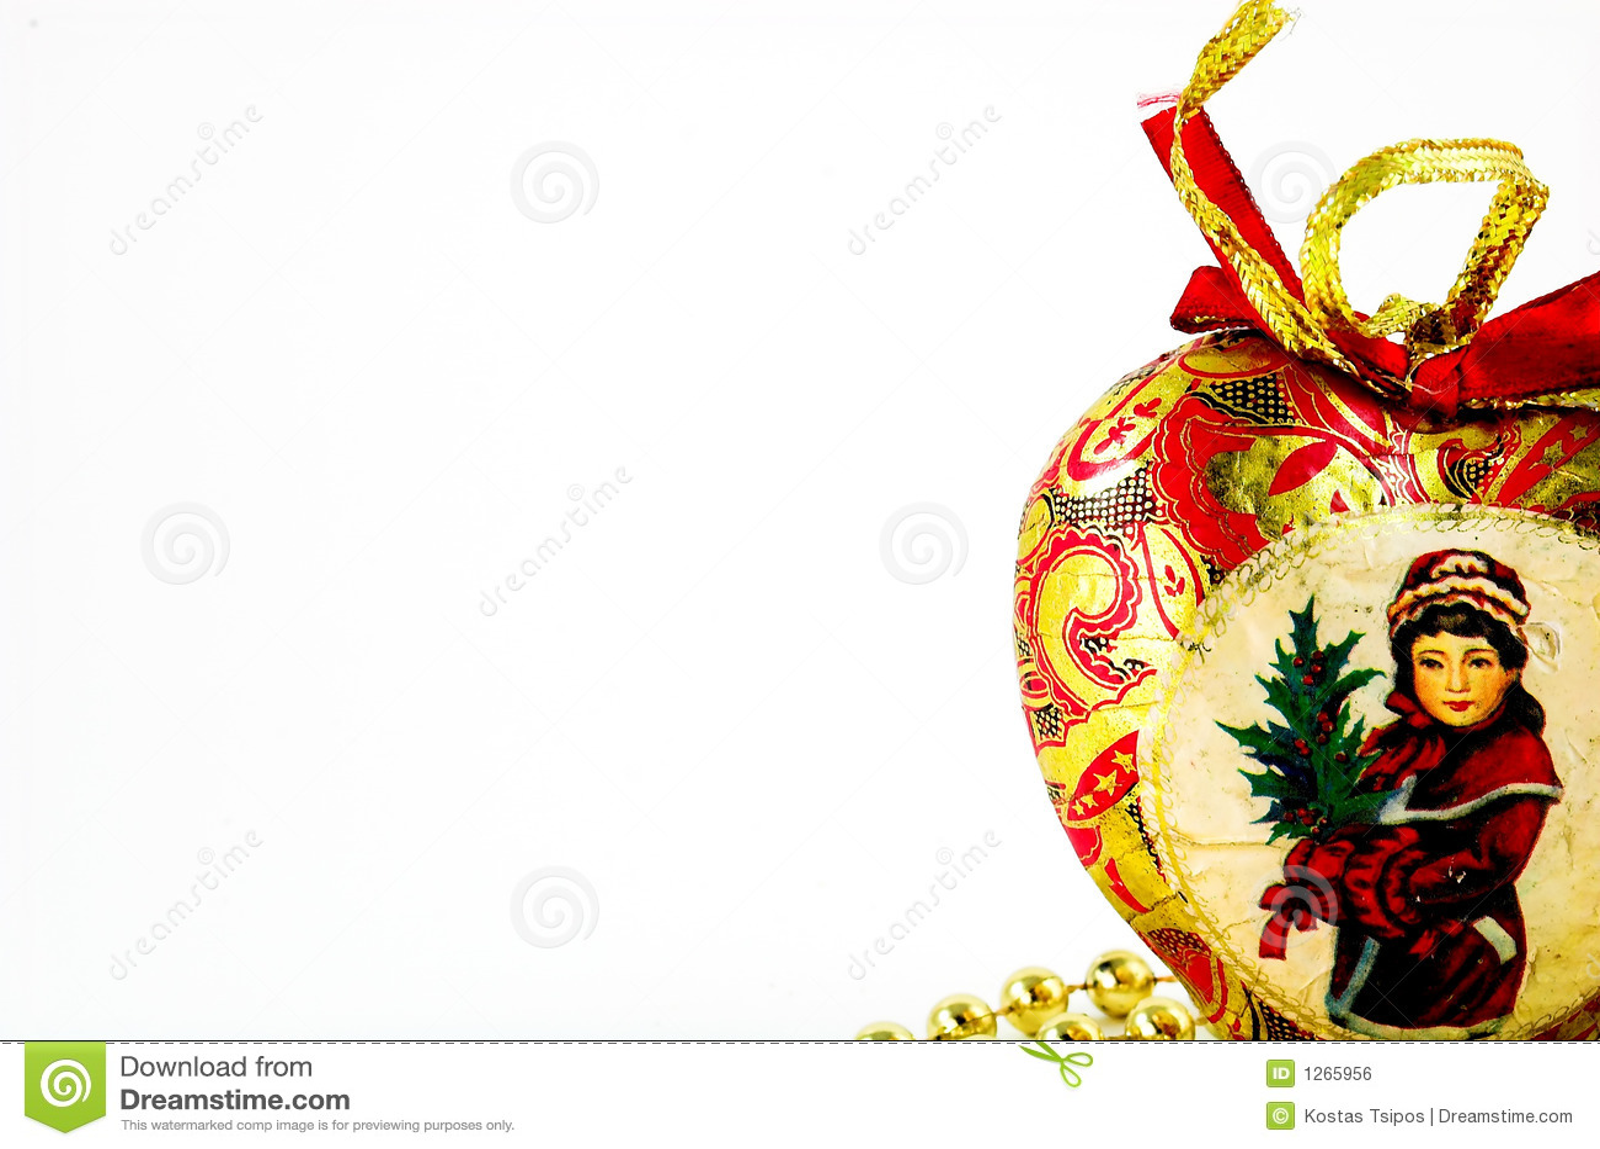 Vintage Christmas Heart Royalty Free Stock Image - Image ...